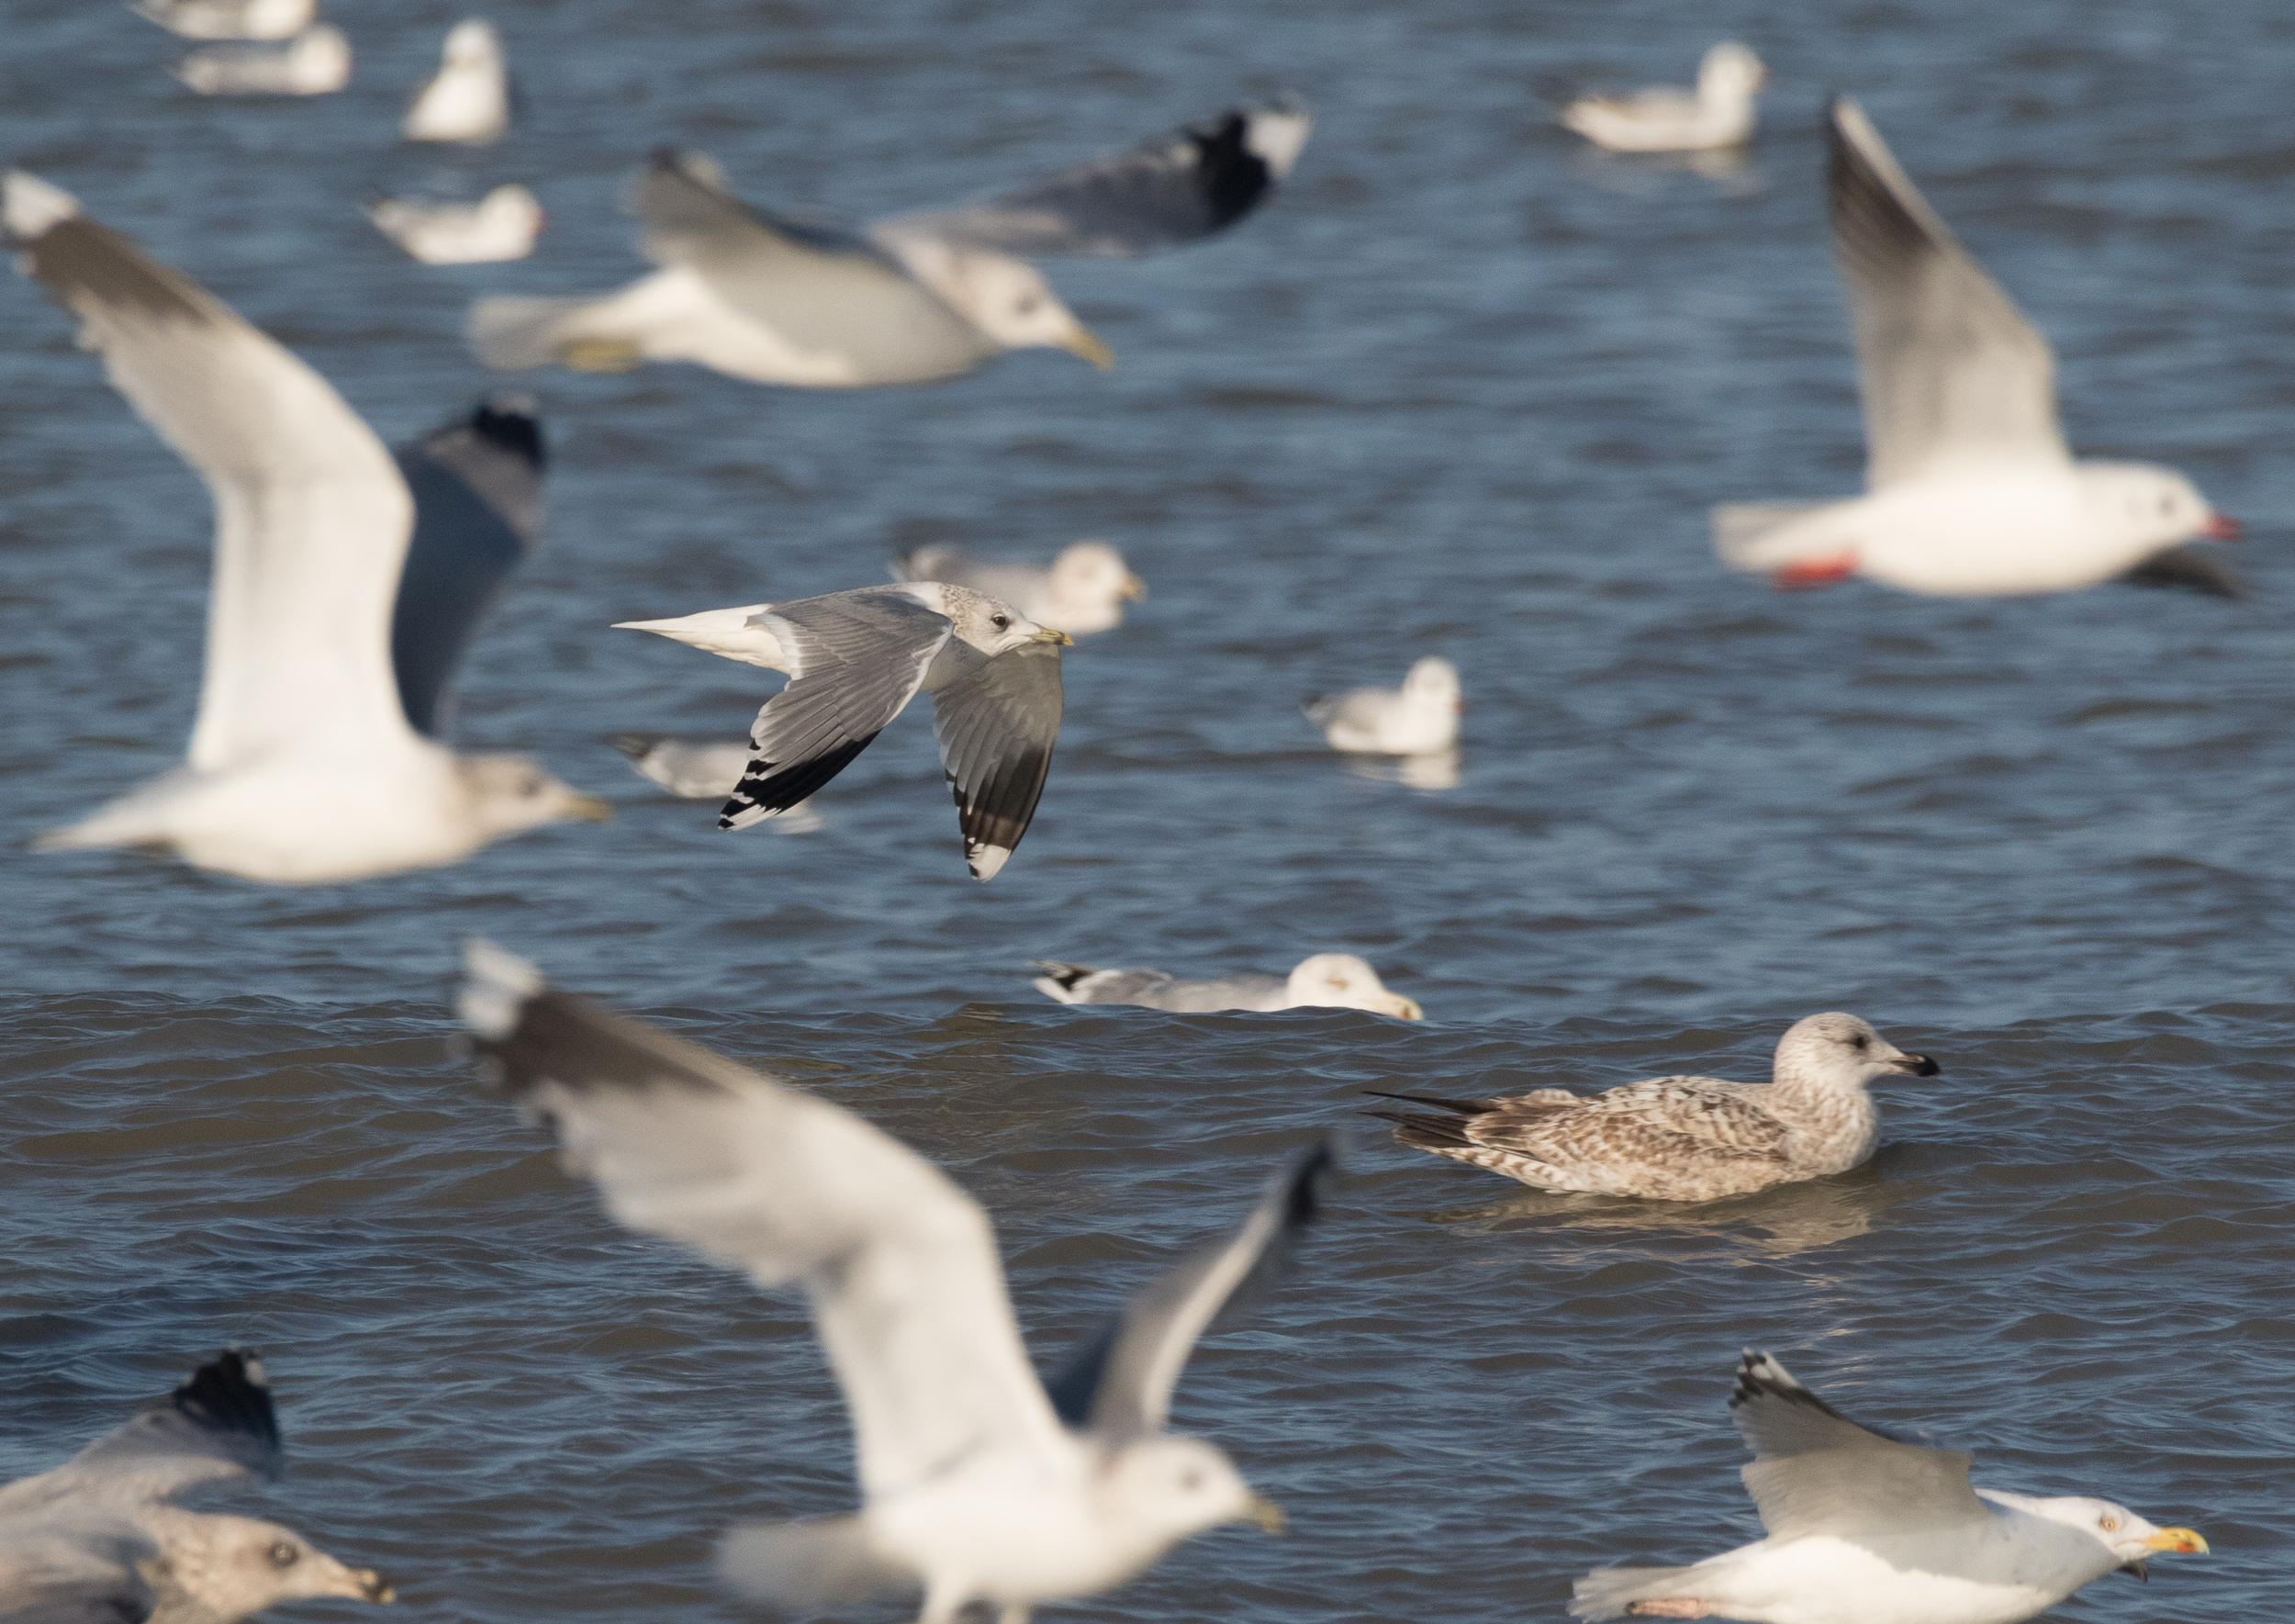 20170121-Common Gull Adult-54.jpg